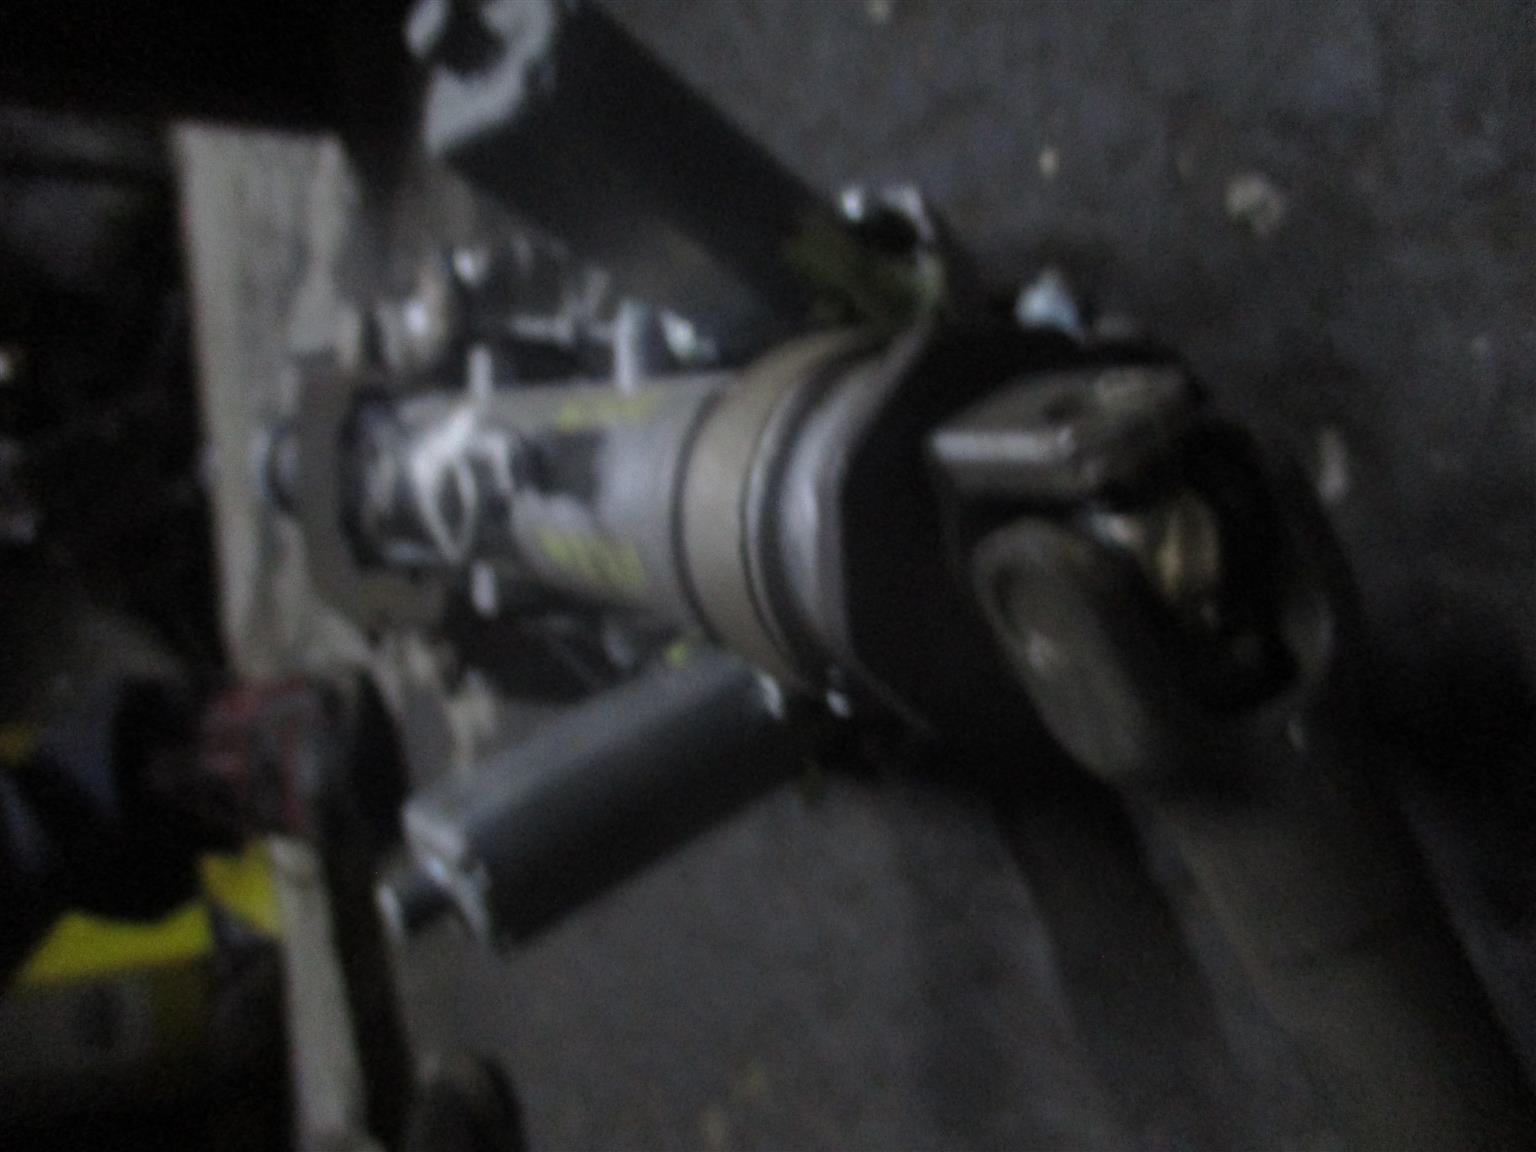 mercedes benz w211 steering coloum for sale